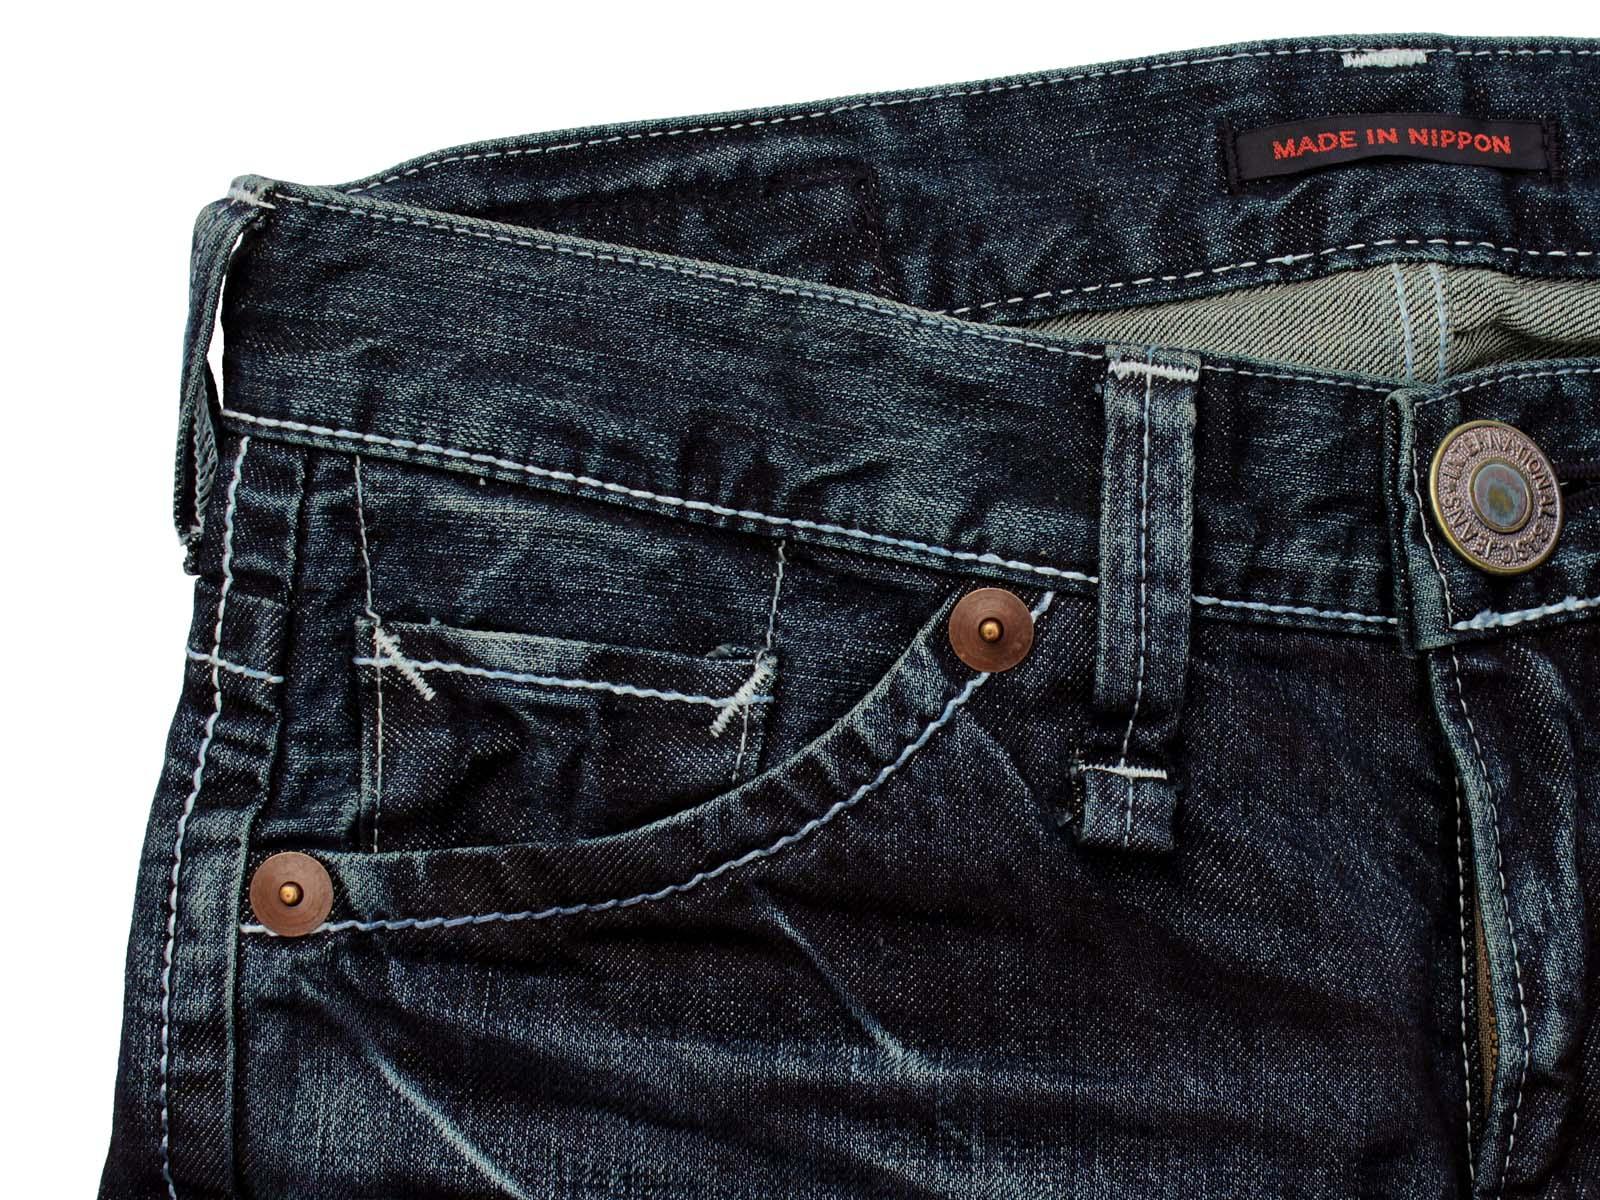 BLUEWAY: 复古牛仔布工程型牛仔裤 (蓝色麻花): M1634 5435 BLUEWAY (blueway) 牛仔裤